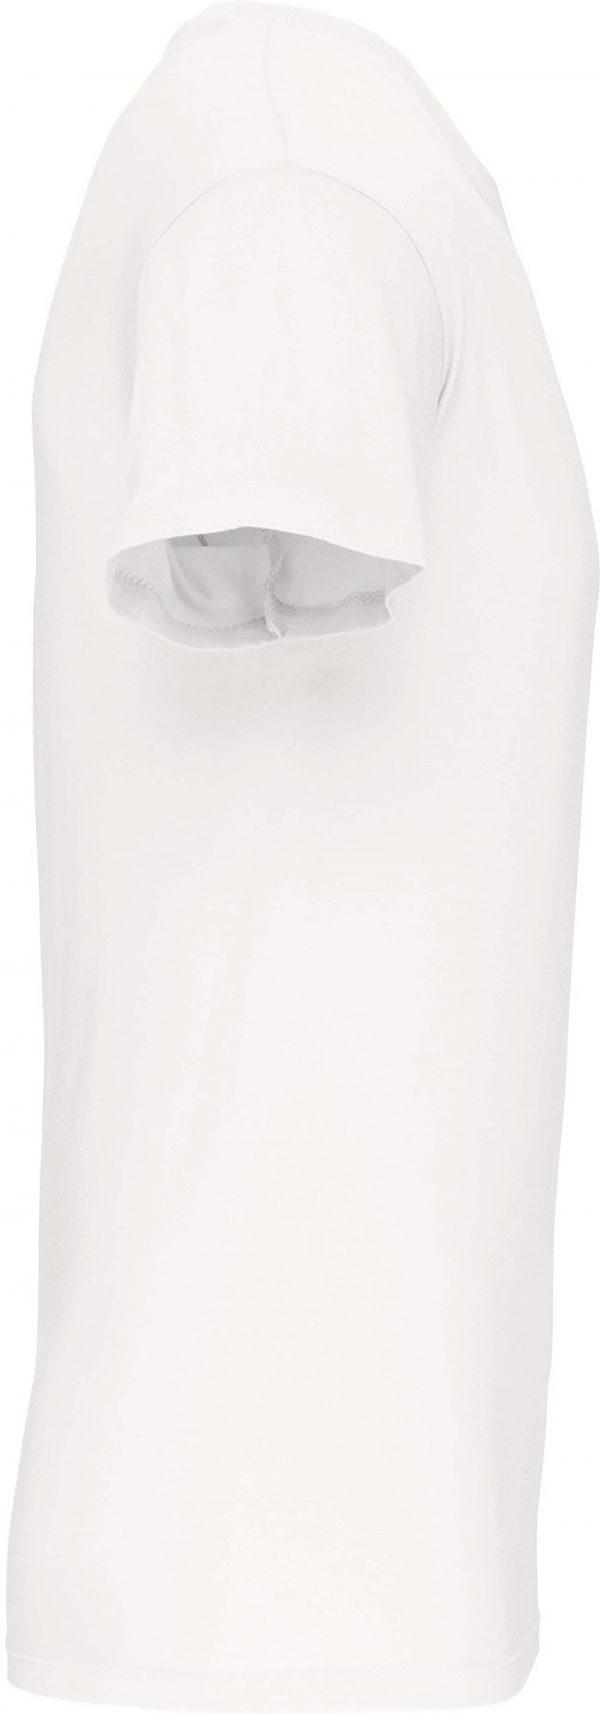 Tee Shirt Blanc Col V Homme 2   Soirée Blanche